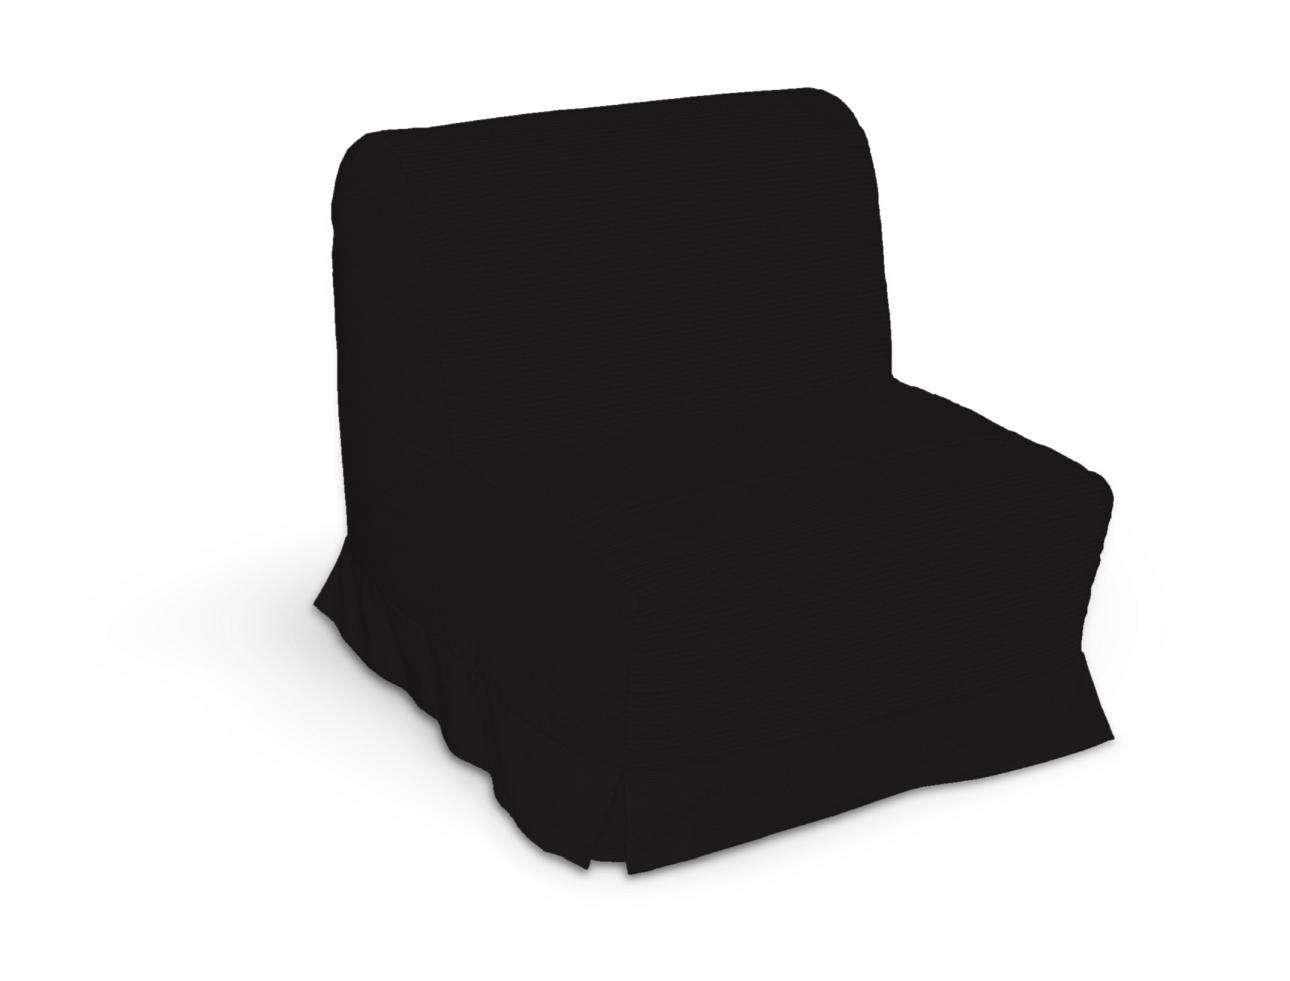 Lycksele Sesselbezug mit Kellerfalten Lycksele von der Kollektion Cotton Panama, Stoff: 702-09